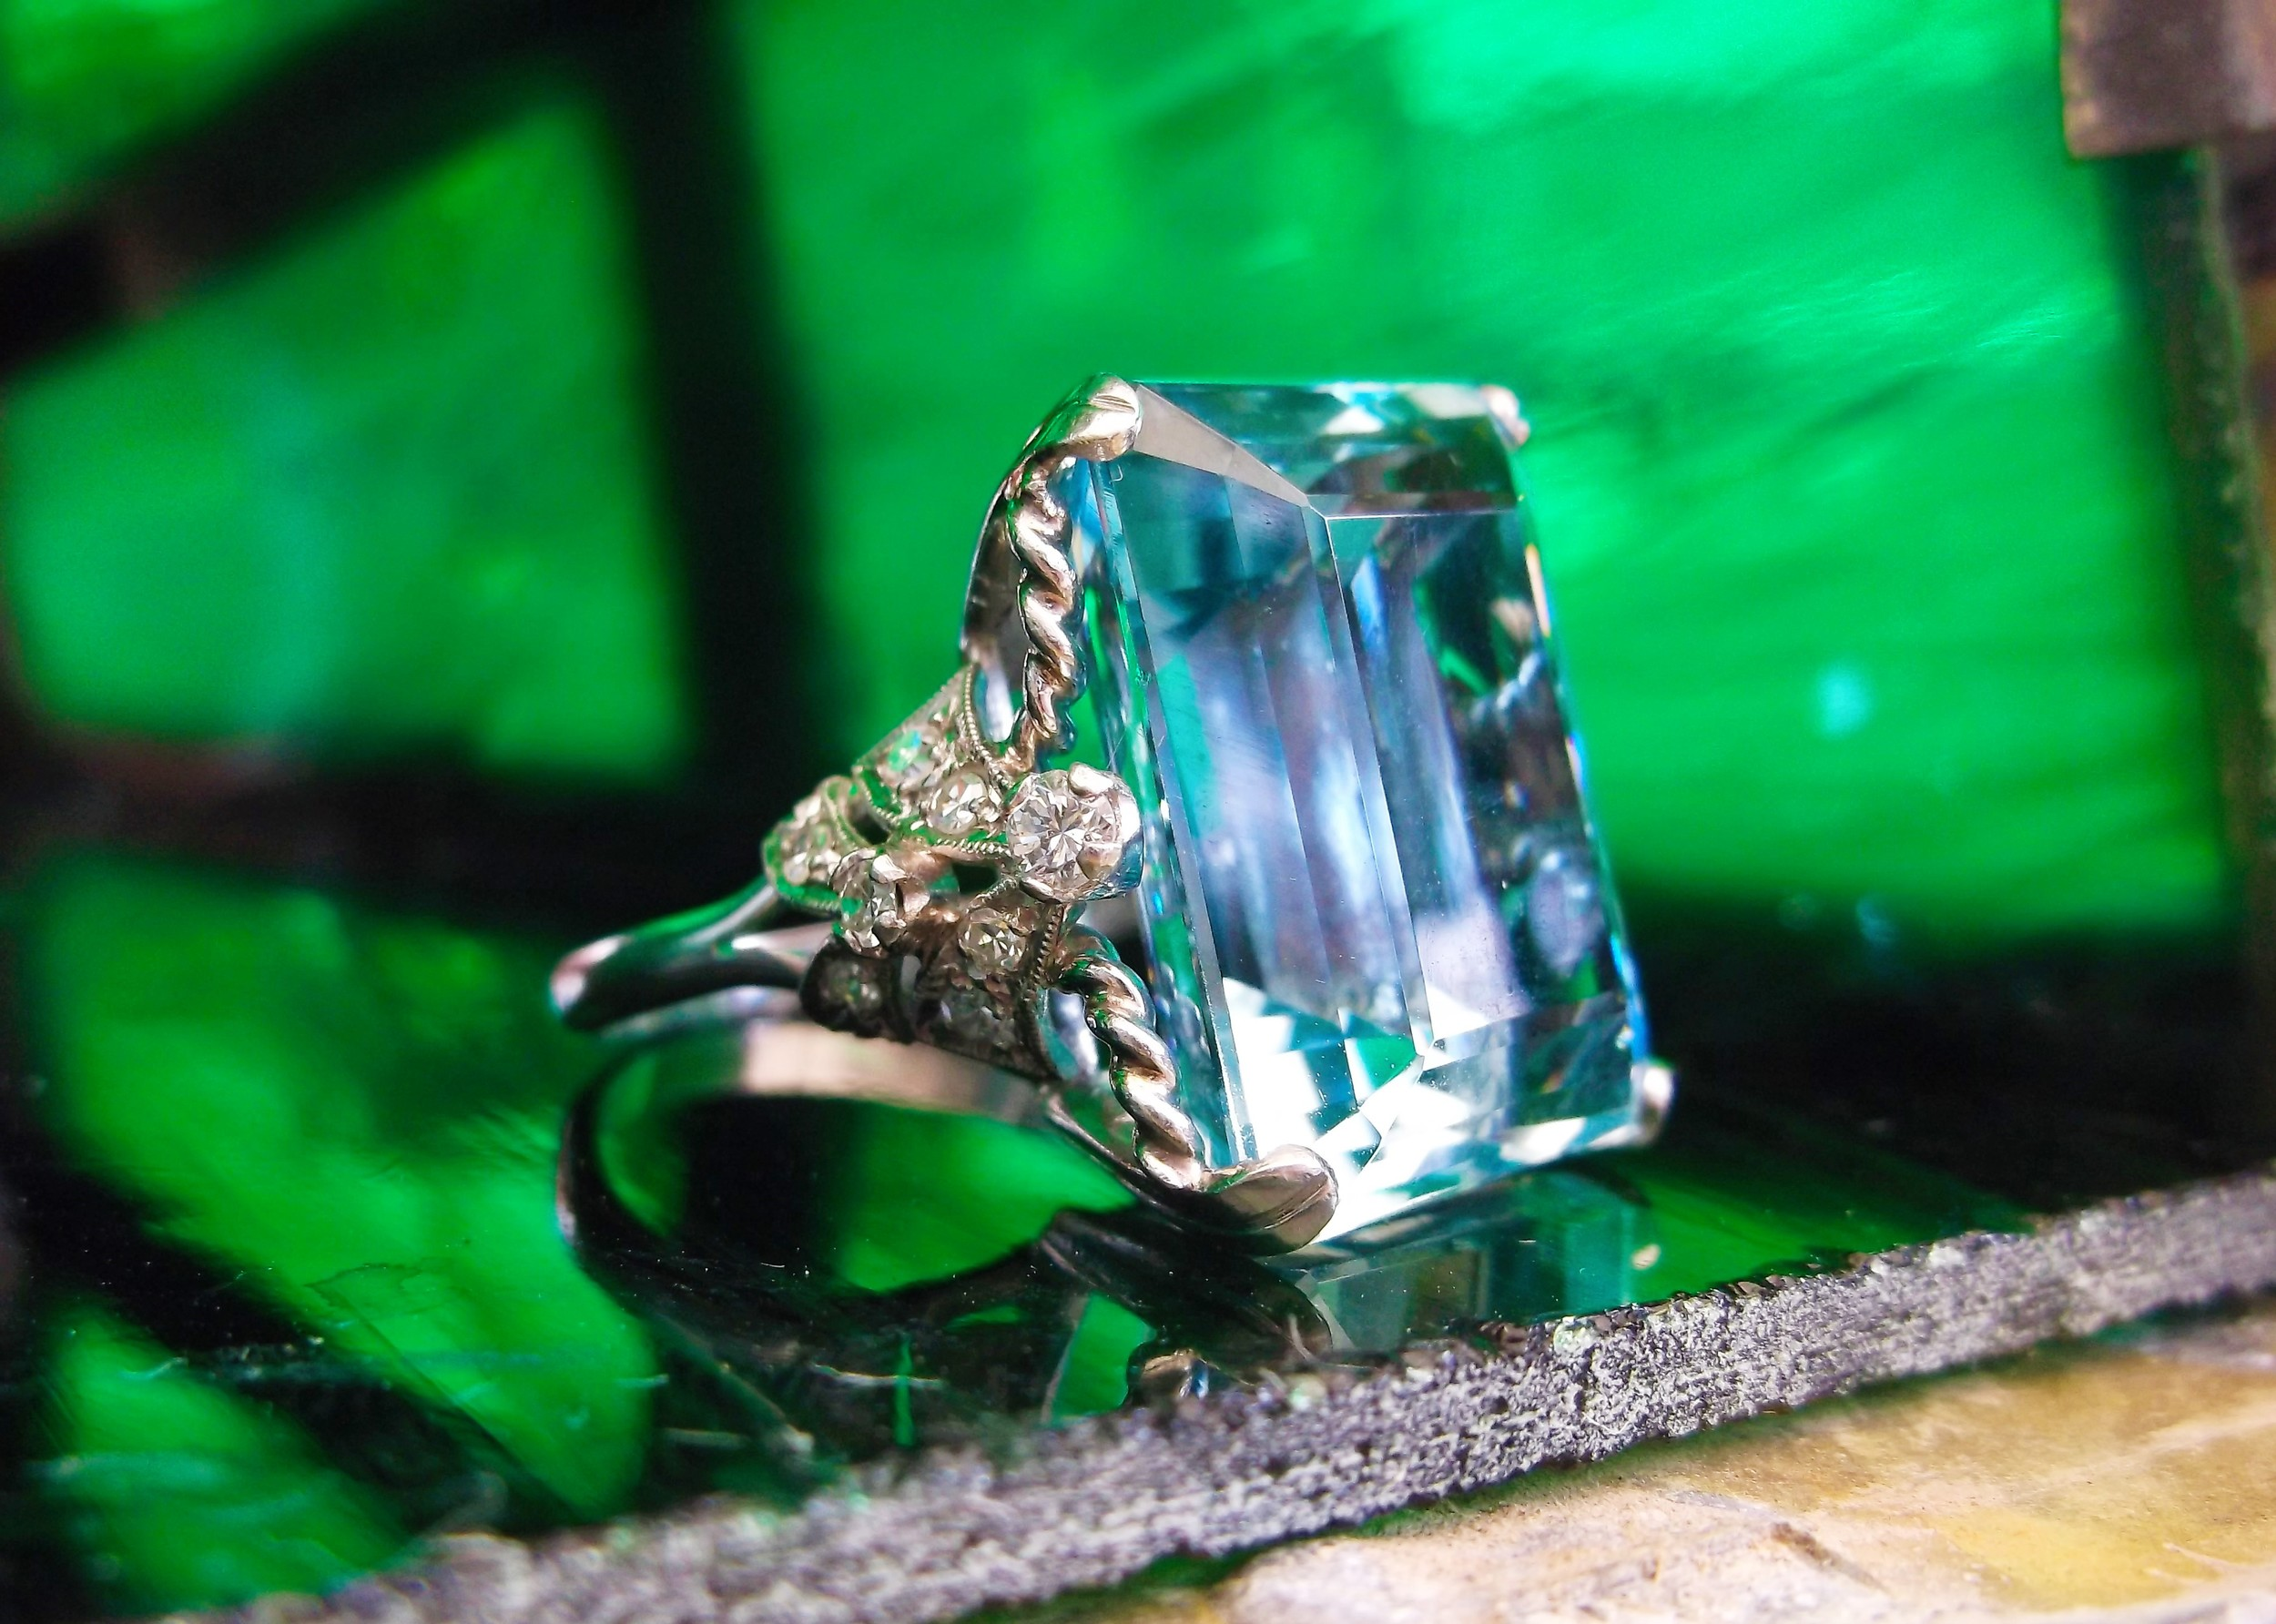 SOLD - Breathtaking 1920's 23 carat aquamarine set in a beautiful diamond and platinum mounting.